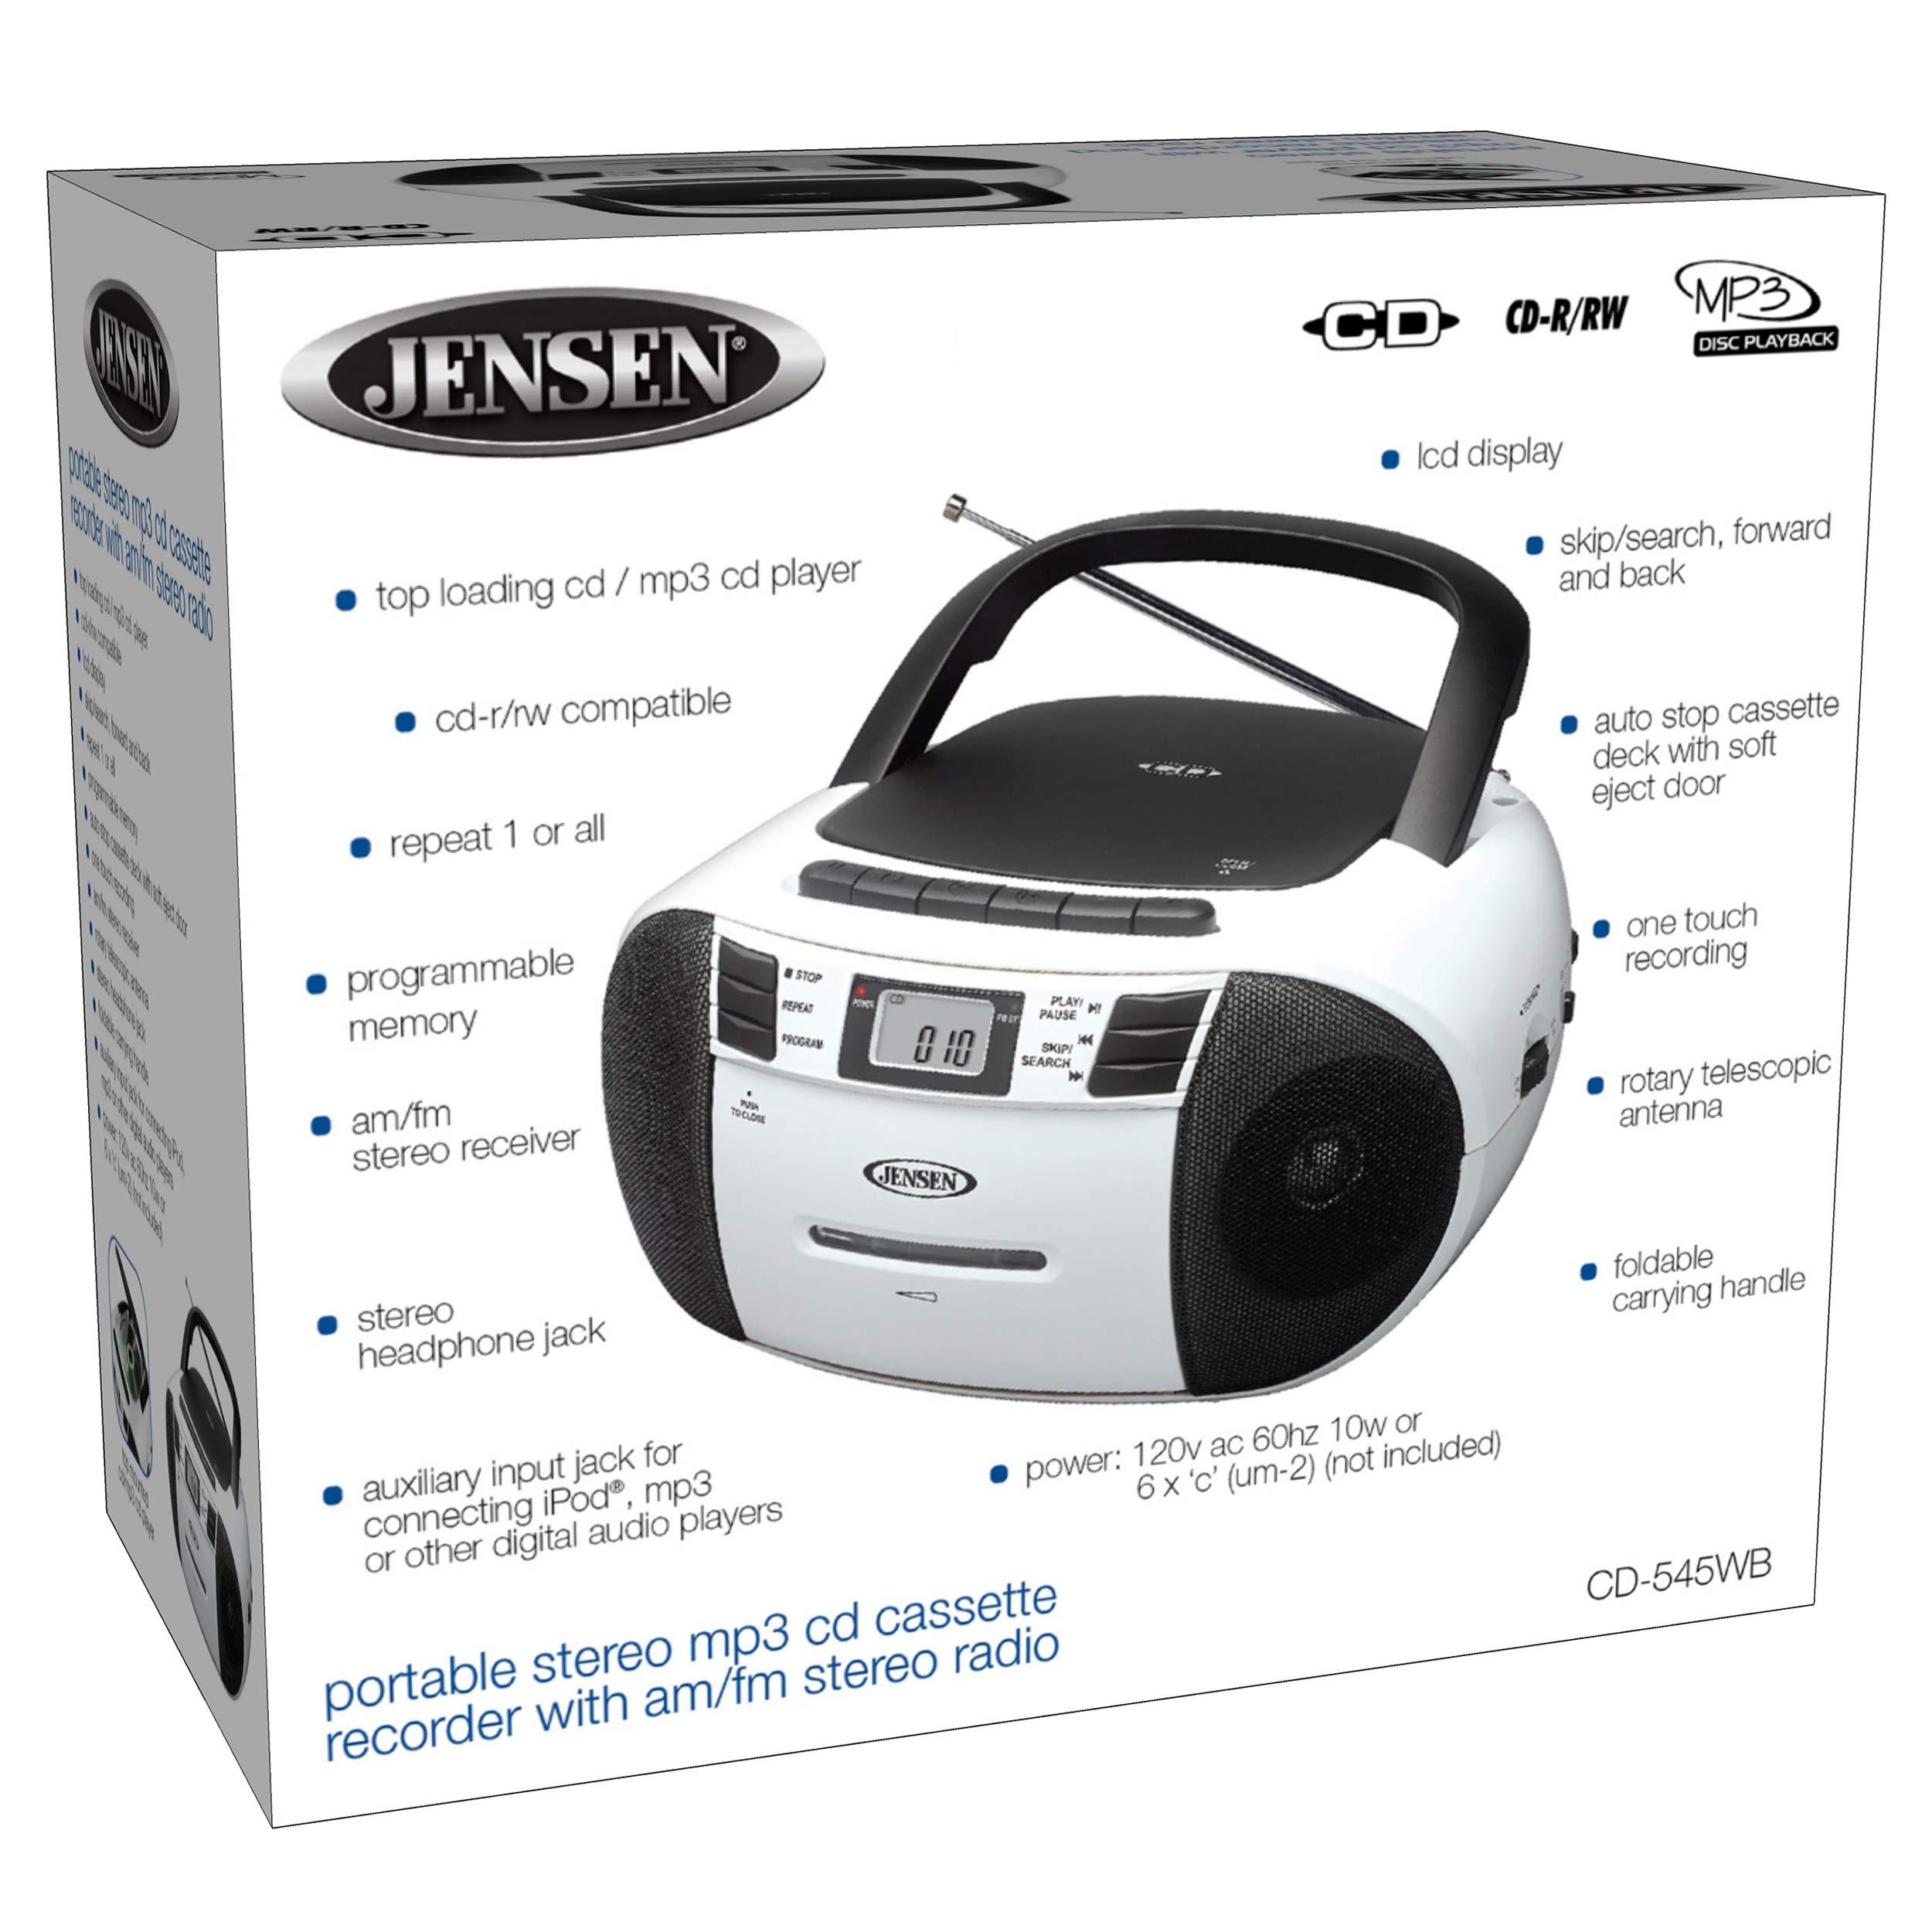 Jensen CD-545MP3 Black/White Top-Loading CD/MP3 AM/FM Radio Cassette Player, and Recorder Boombox Home Audio, Aux, Headphone (Black/Matte White) by Jensen (Image #5)